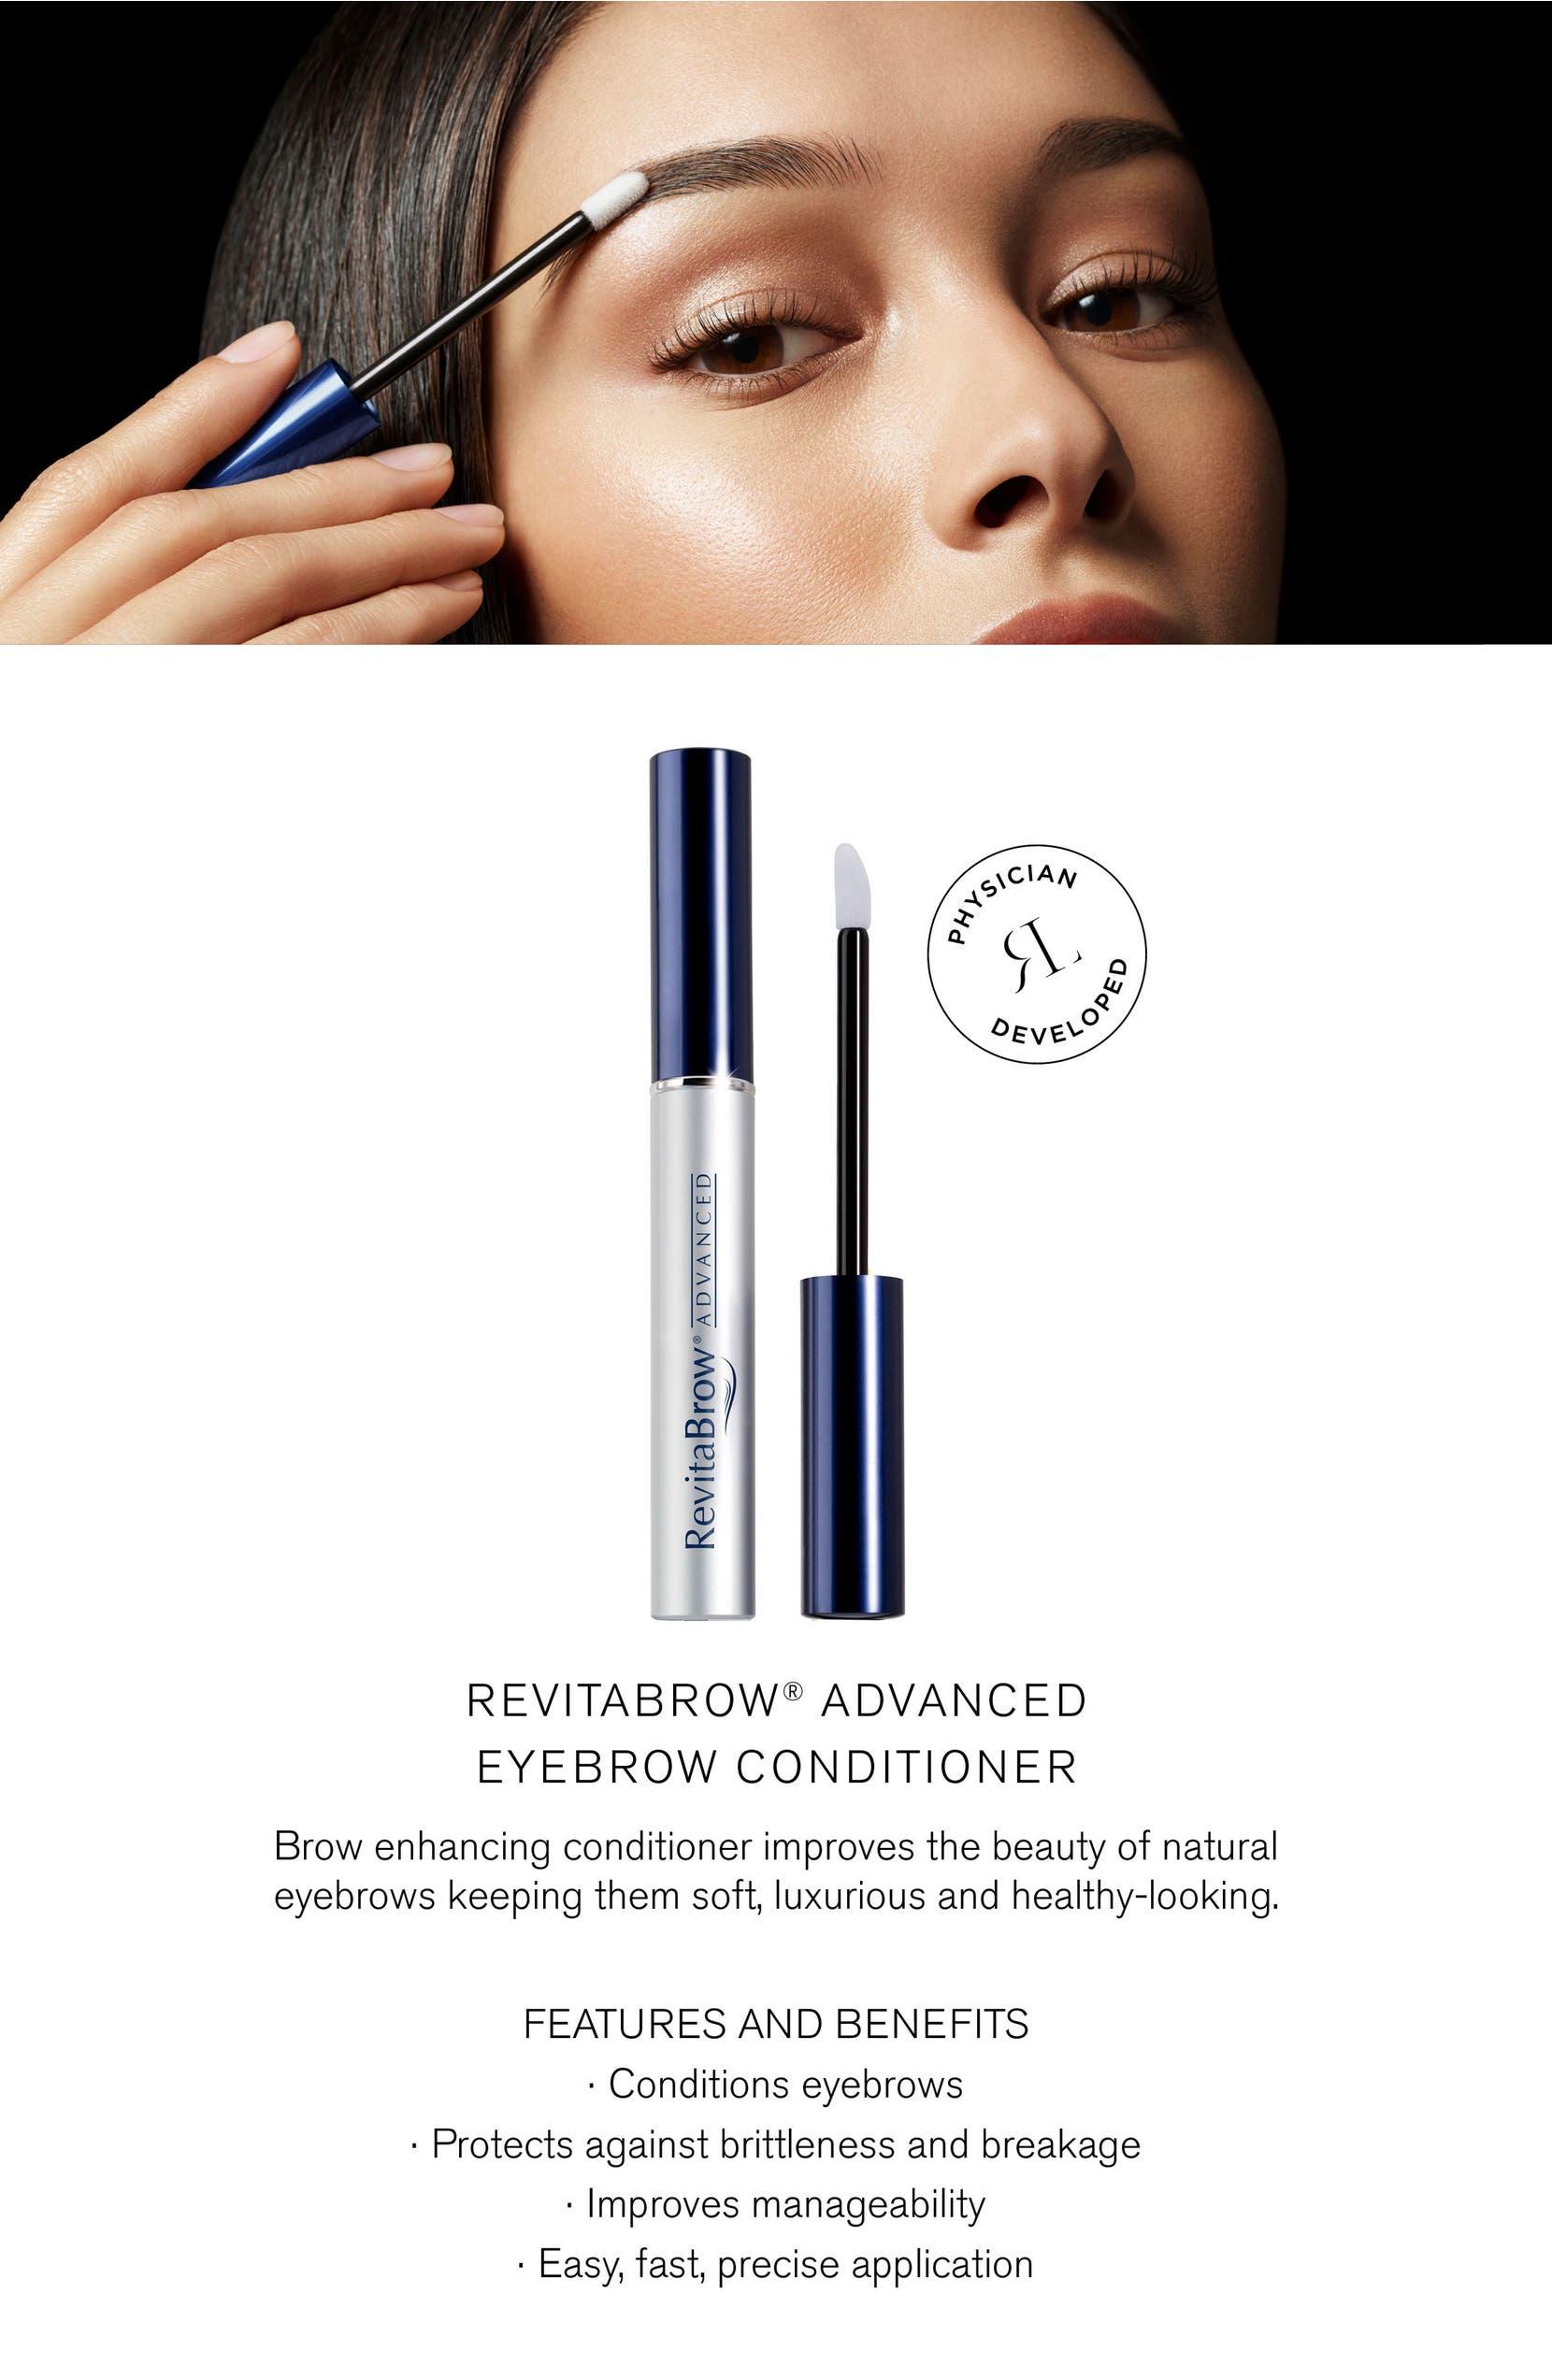 Revitalash Revitabrow Advanced Eyebrow Conditioner Nordstrom